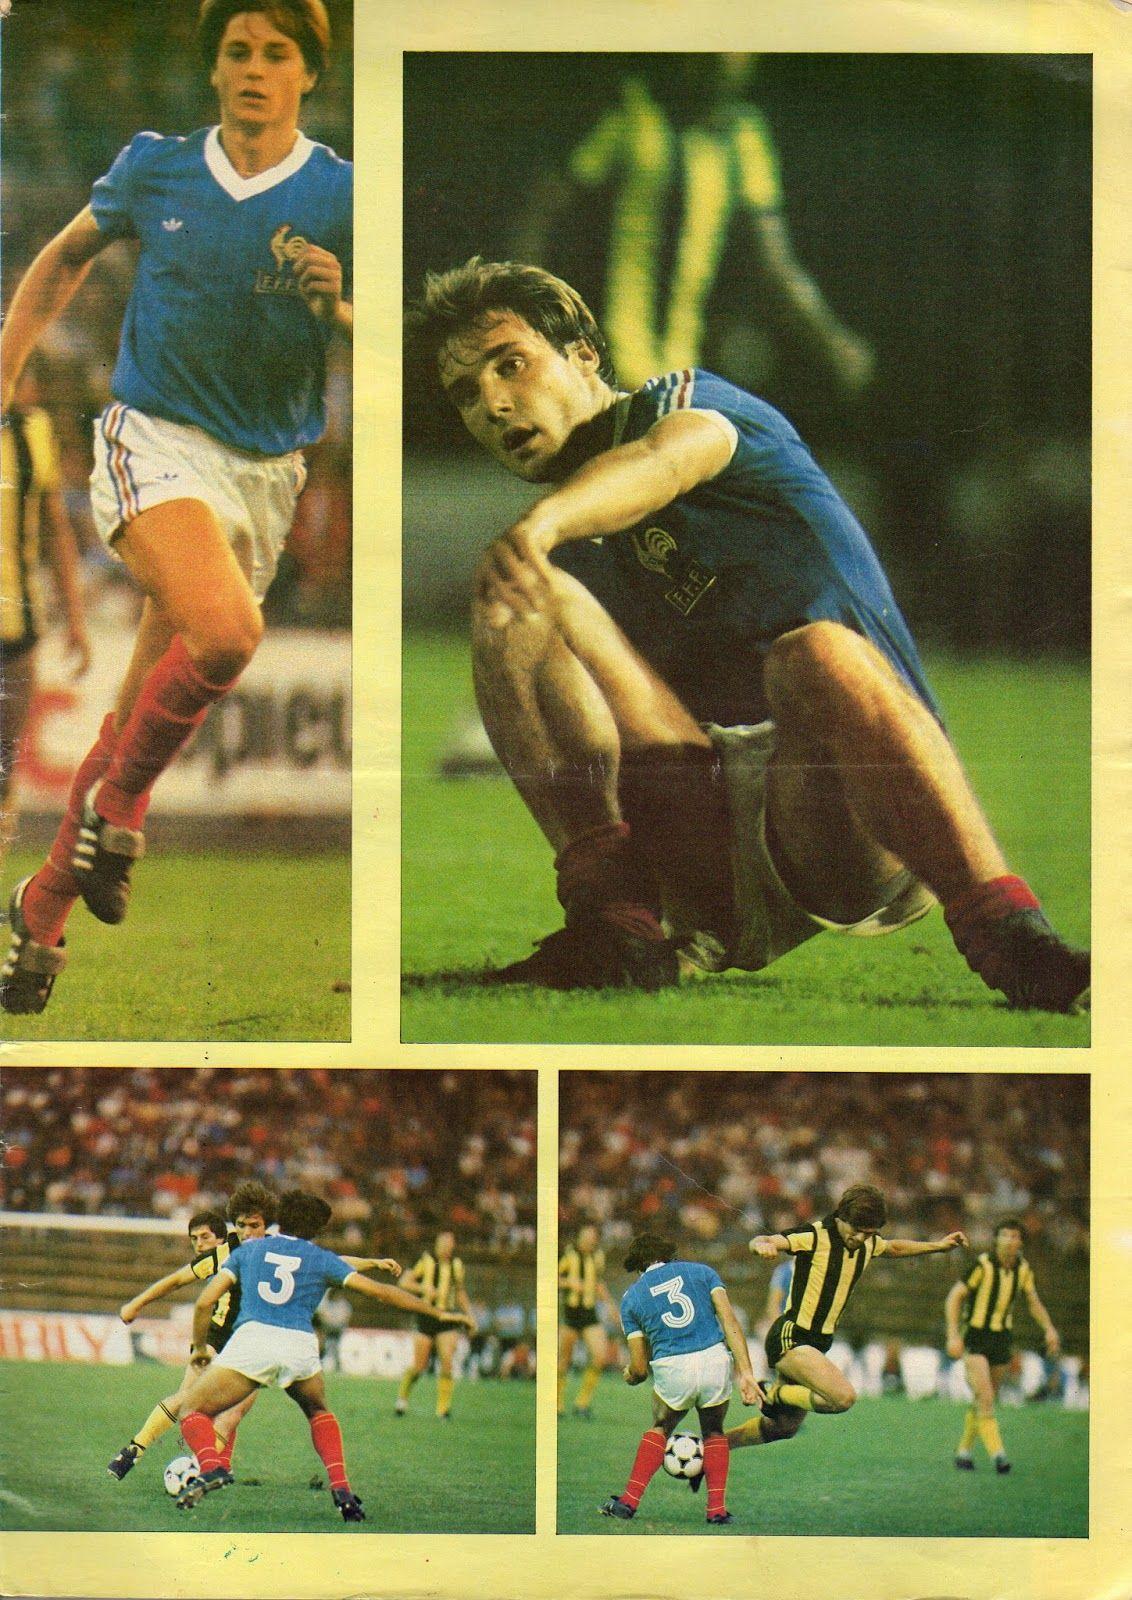 Pin on 1980s Football